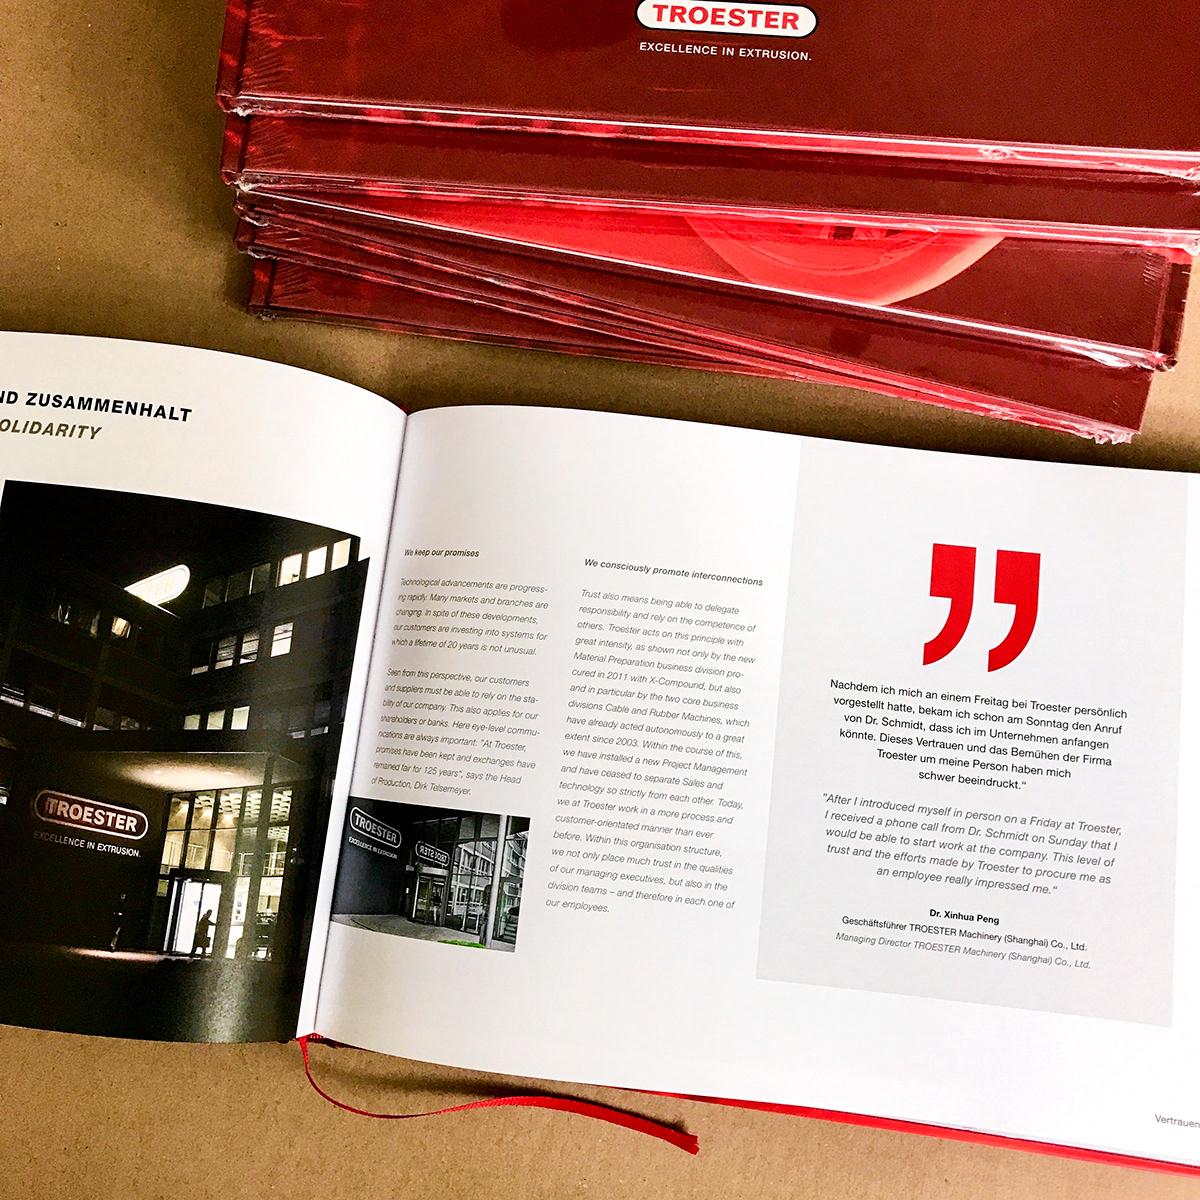 anniversary book buch history Buchgestaltung Corporate Design editorial identity print Book Binding